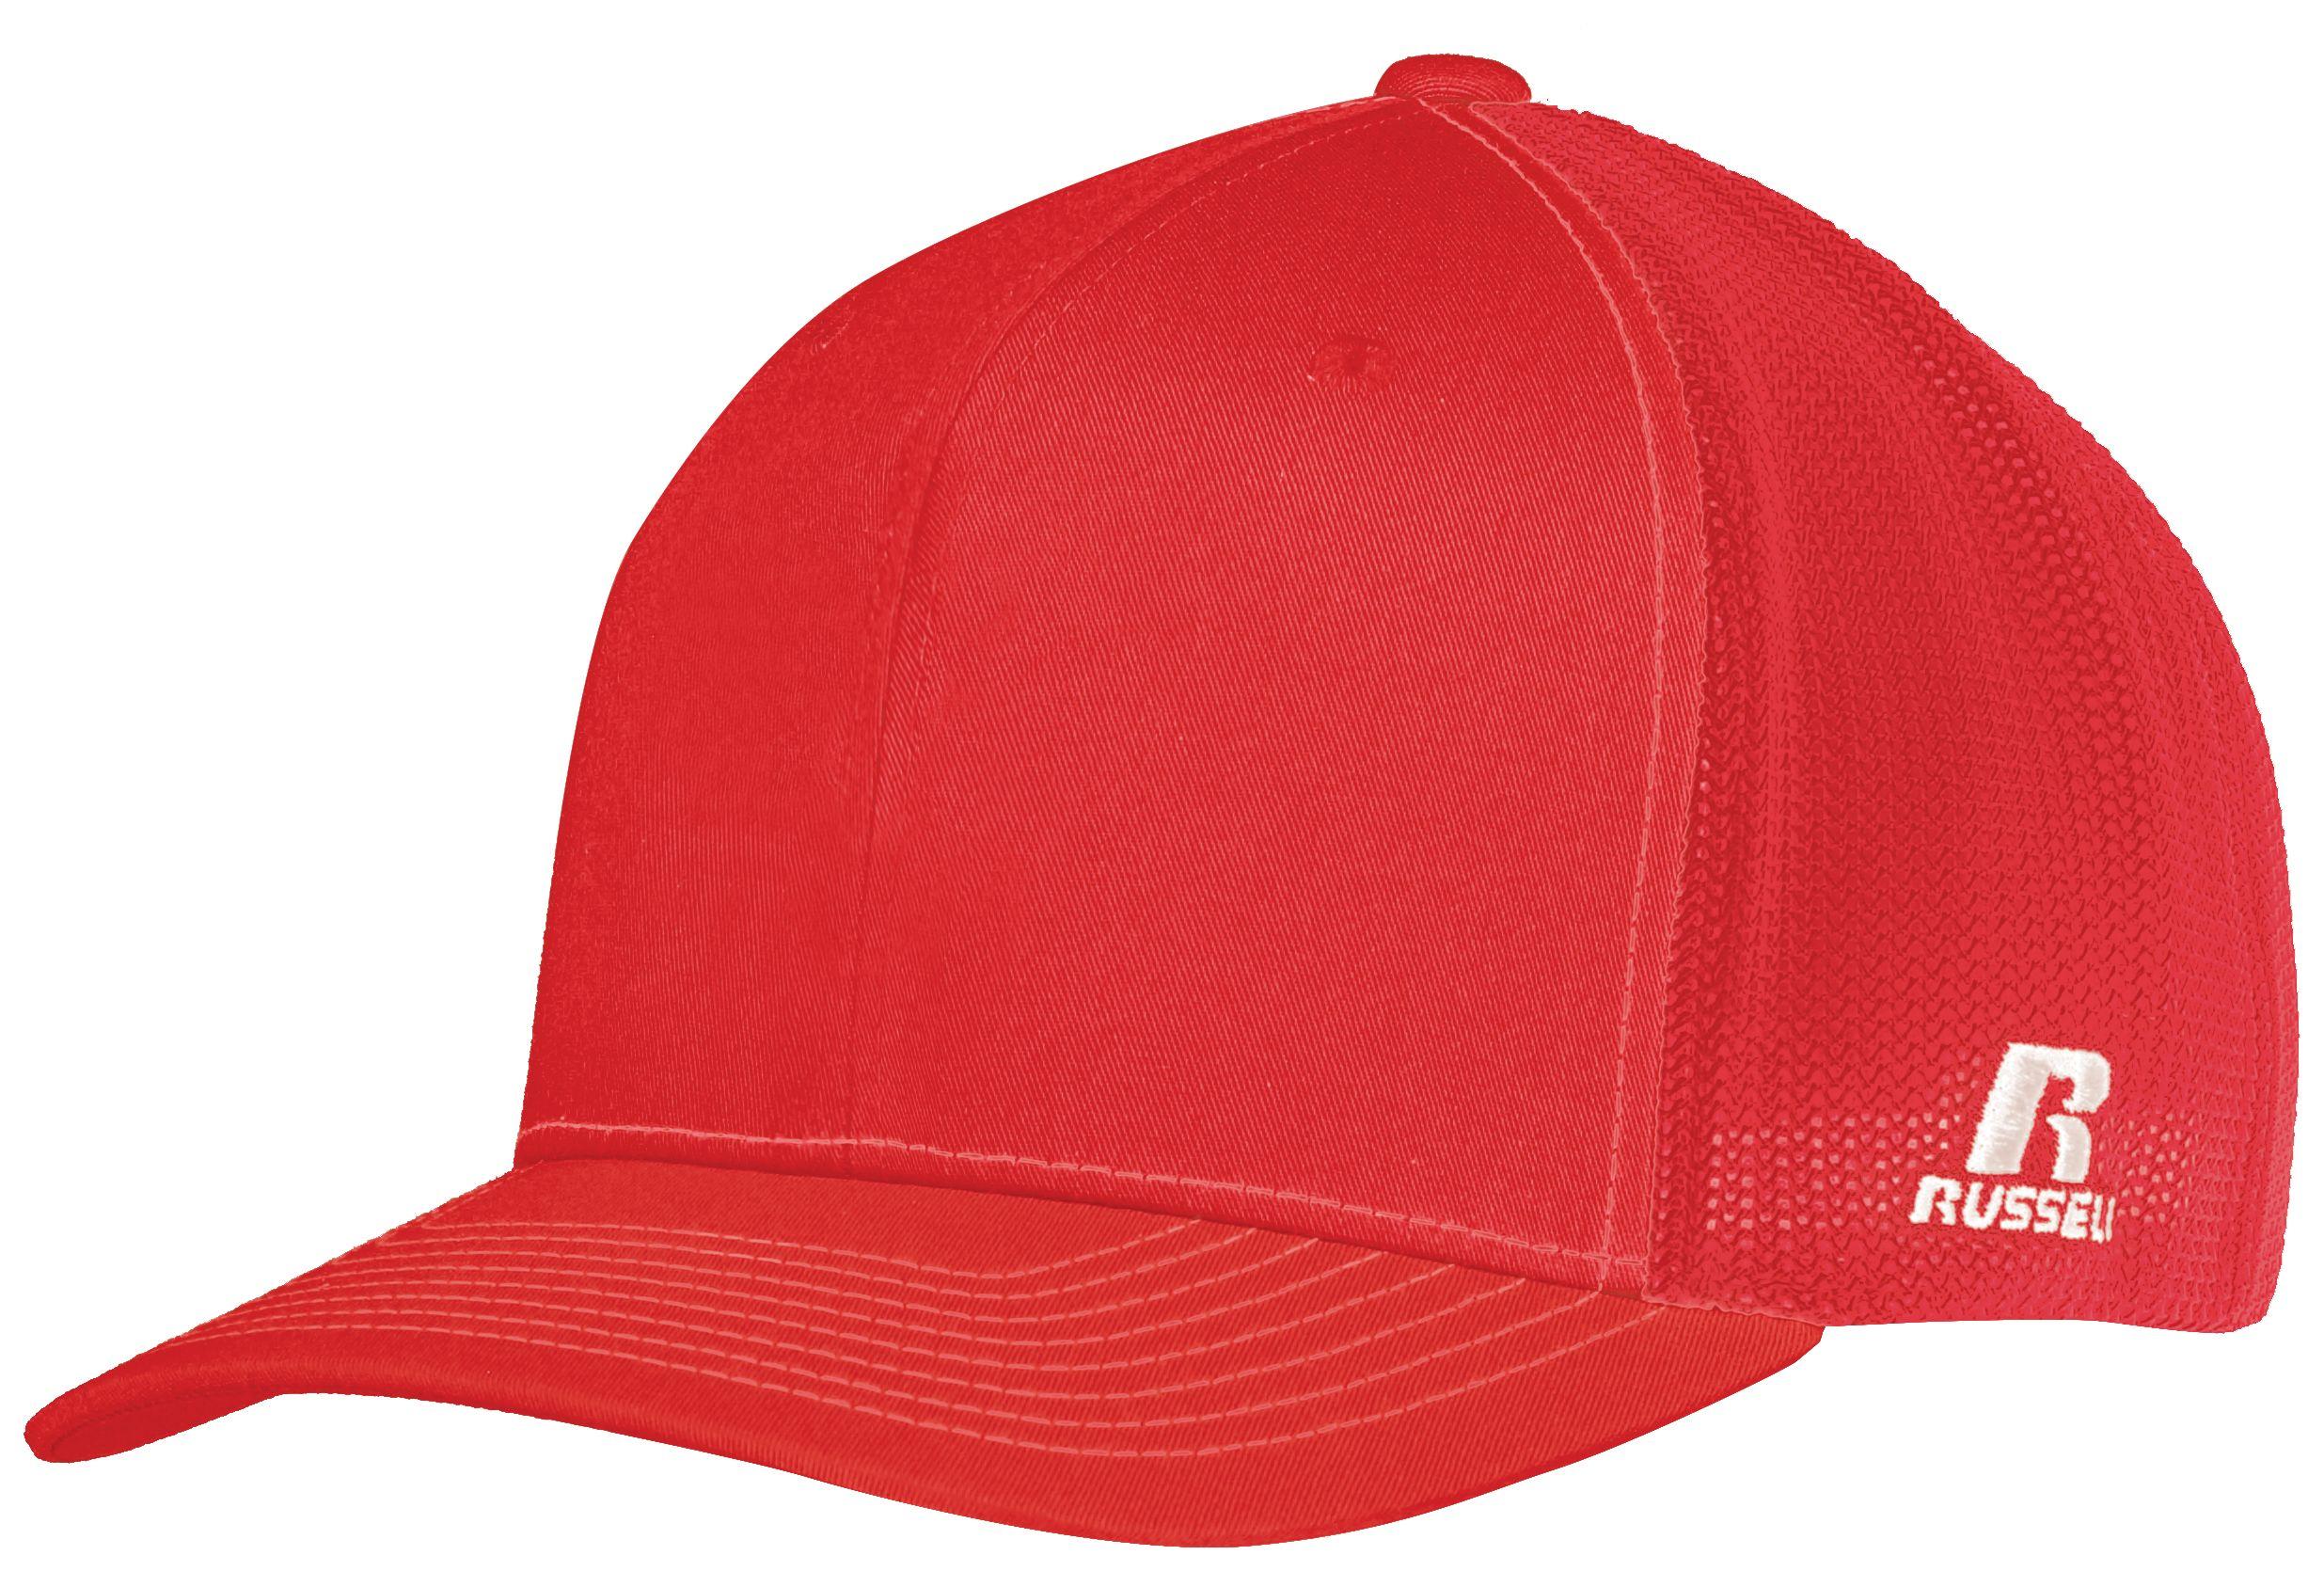 Youth Flexfit Twill Mesh Cap - TRUE RED